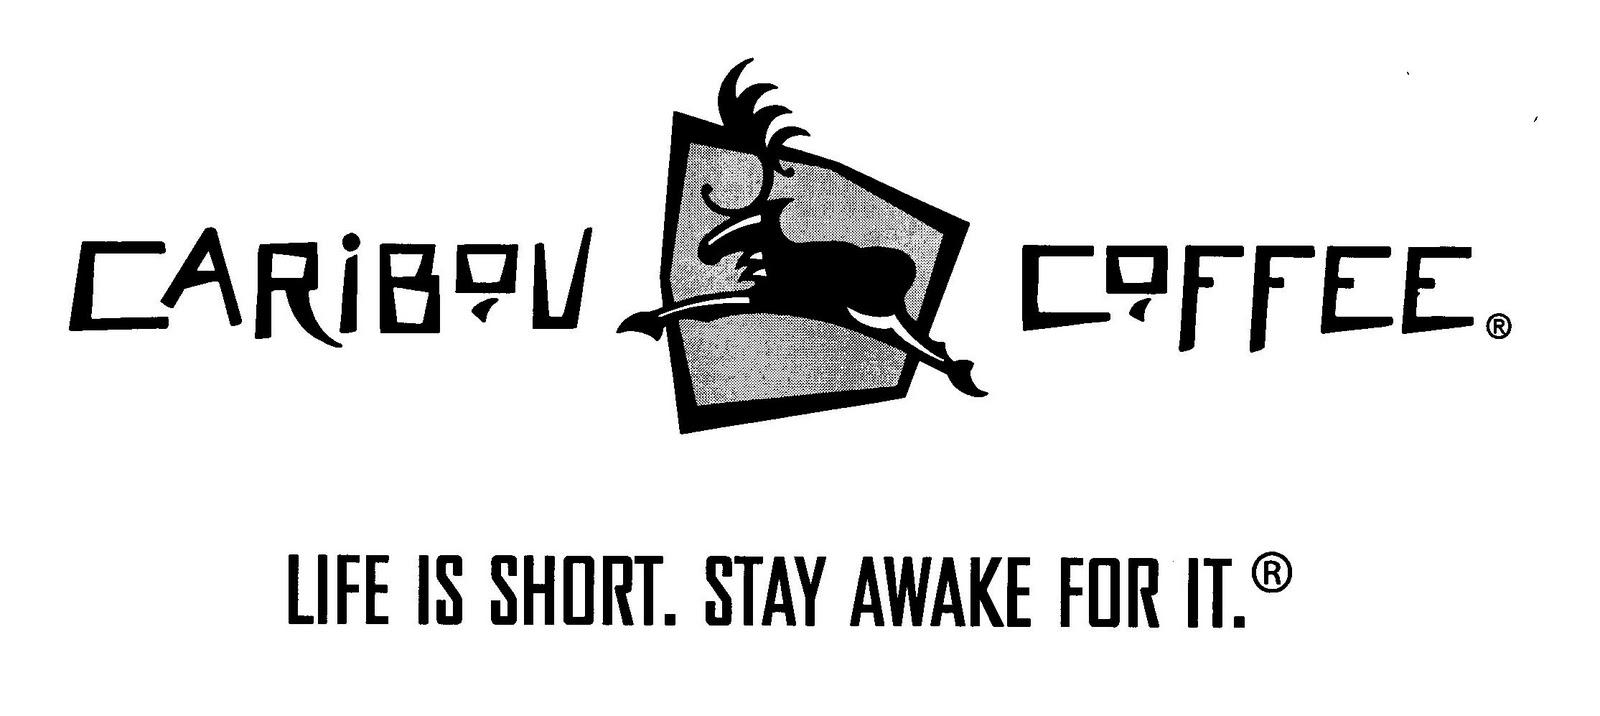 Caribou coffee logo - photo#16